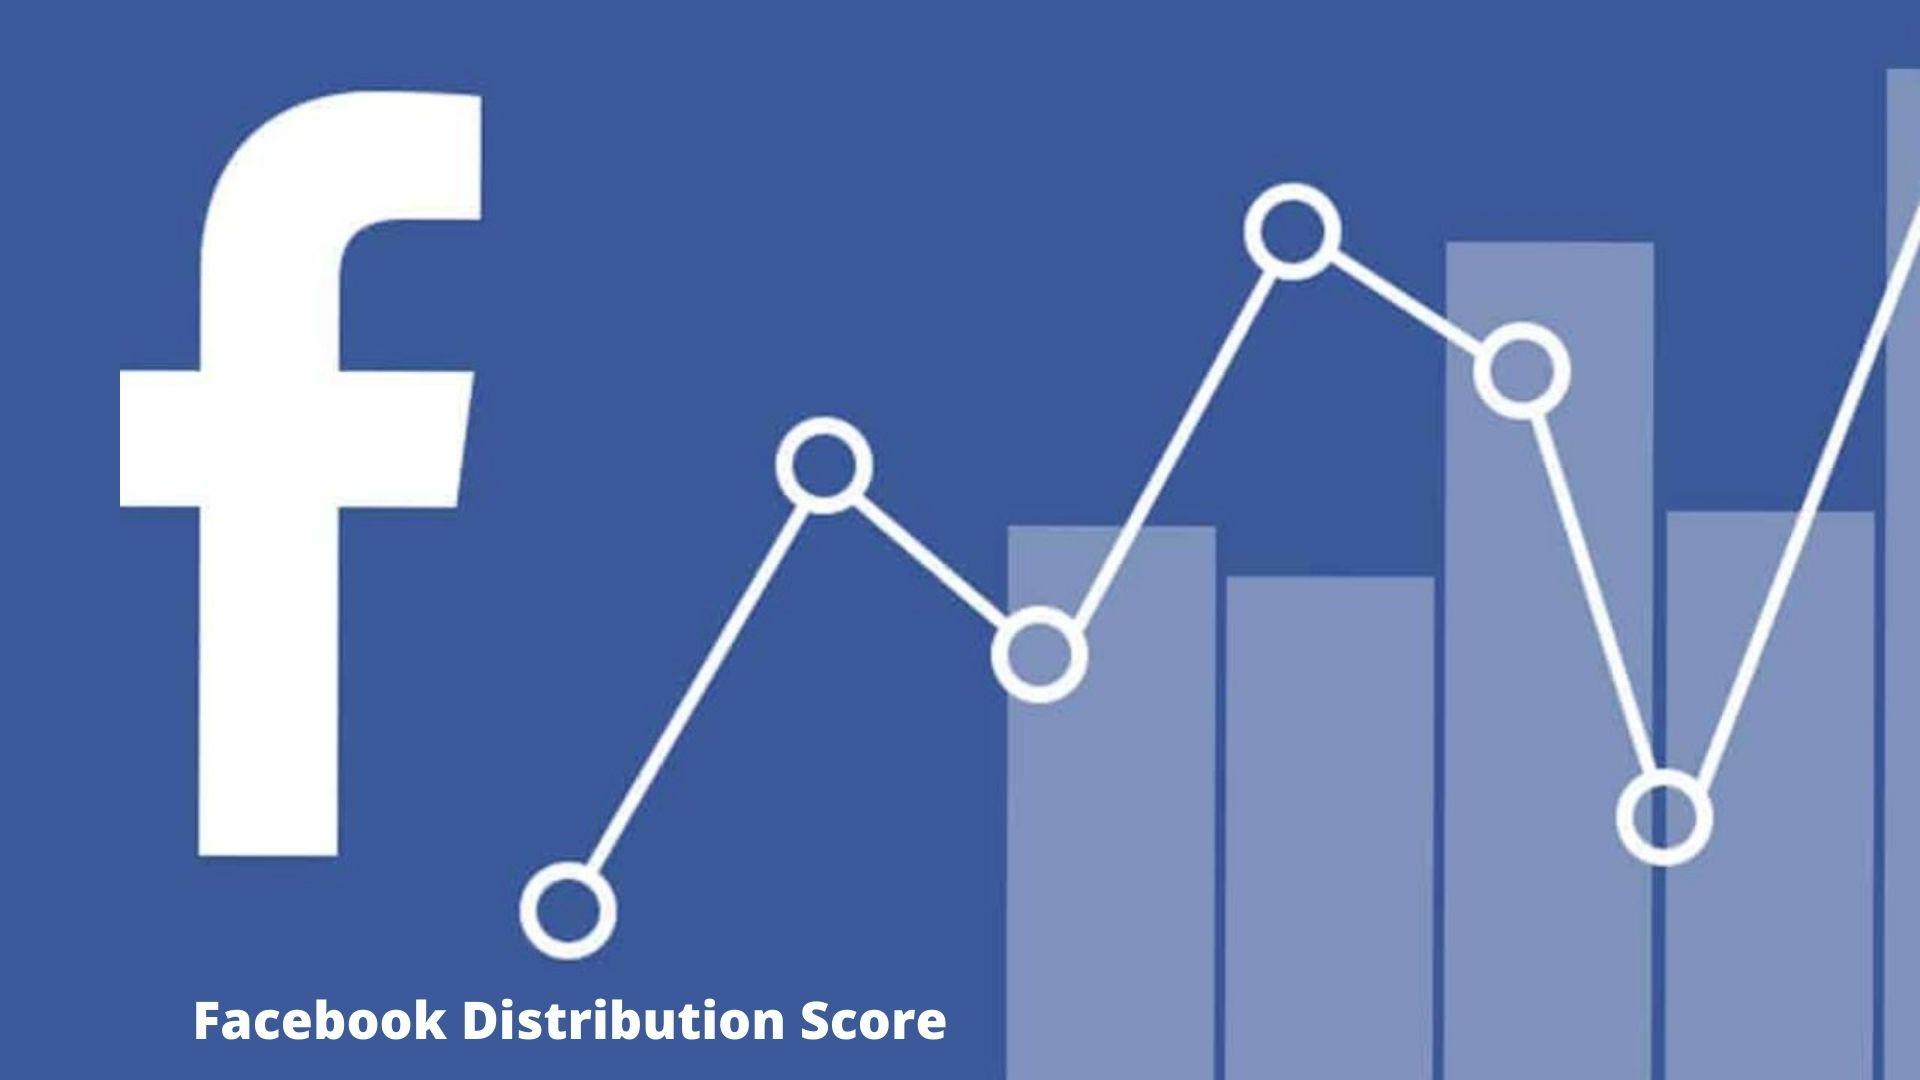 Facebook Distribution Score